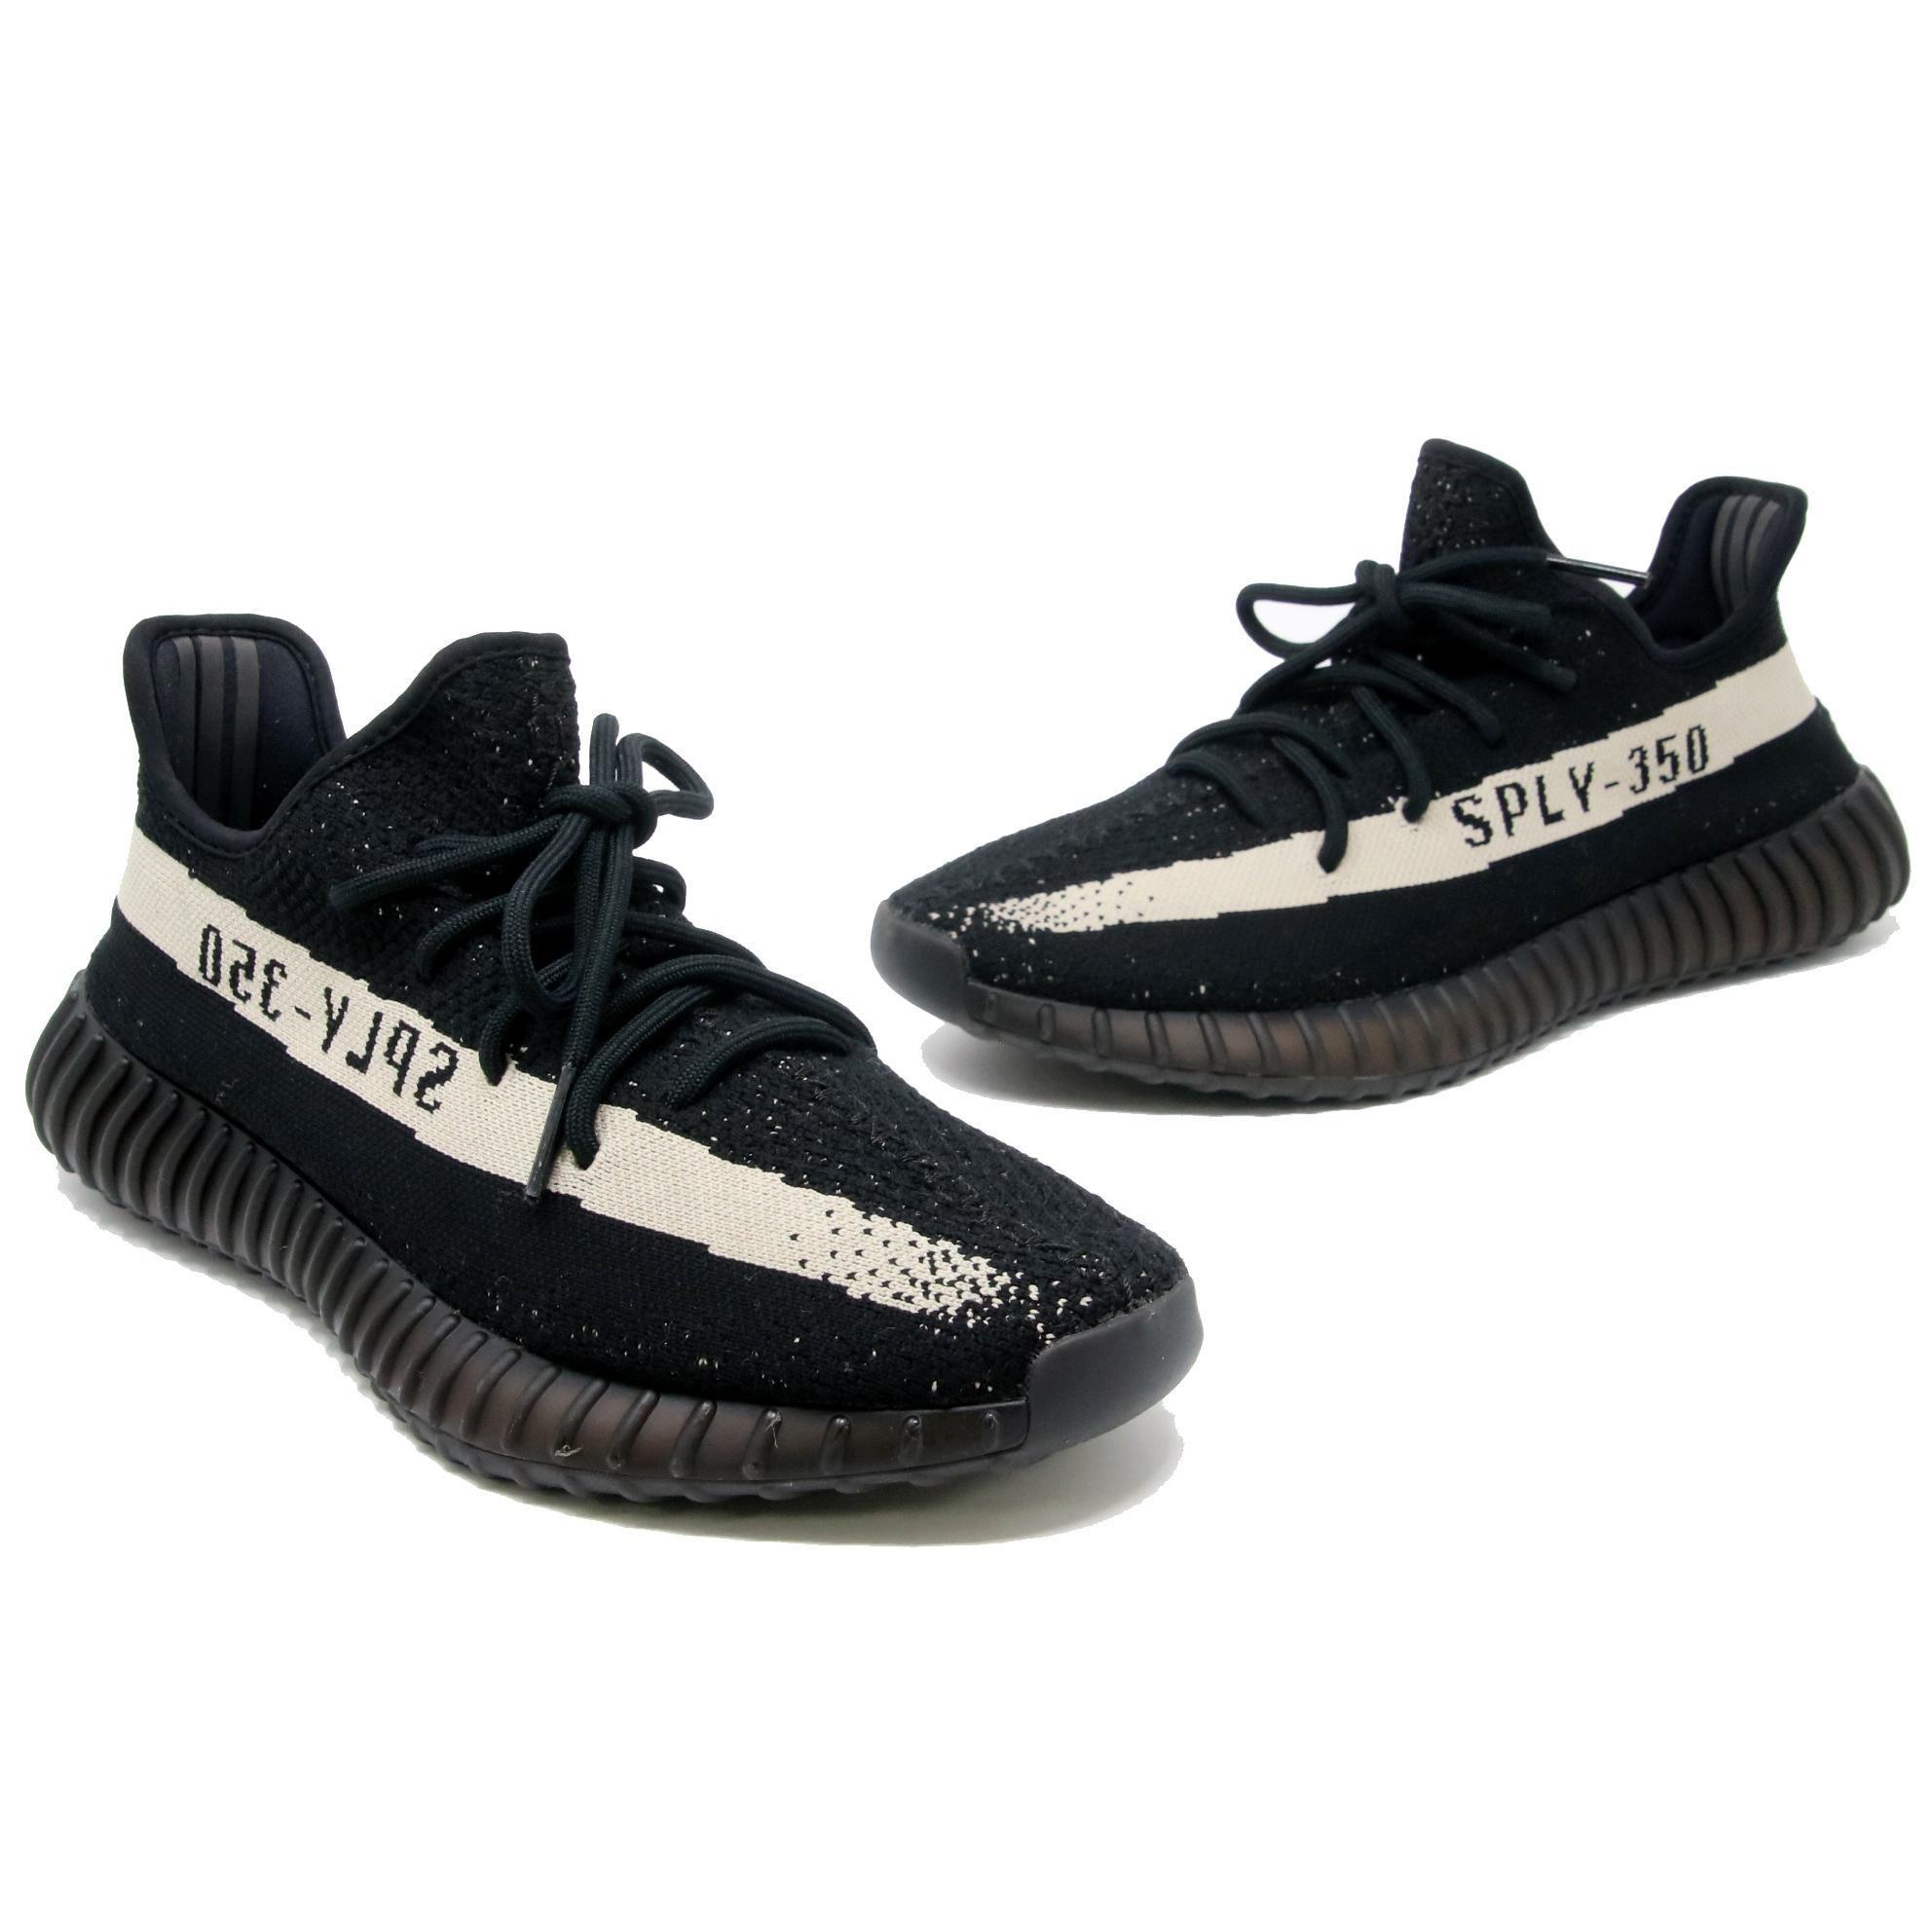 7ab25bedf Adidas X Yeezy Black Boost 350 V2 White Oreo Sneaker sz 10.5 in 2019 ...